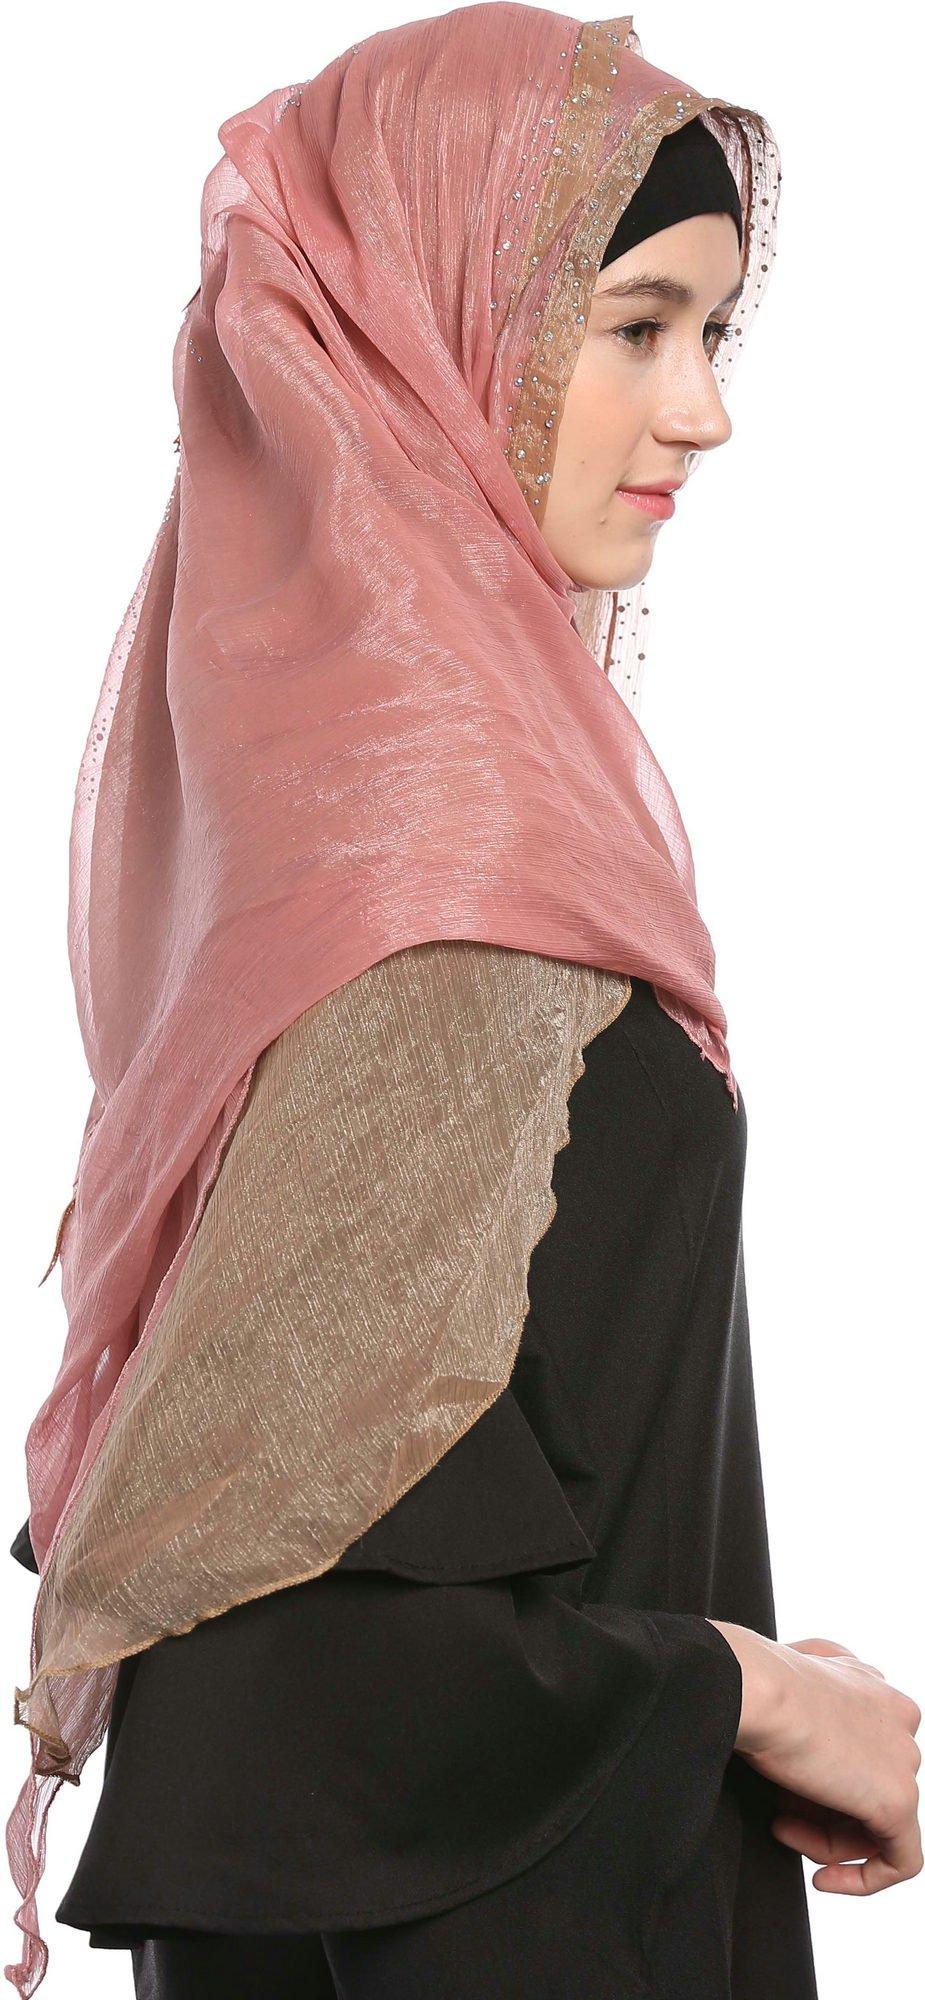 Ababalaya Lace Decorated Wedding Hijab Islamic Hijab,Color3 by Ababalaya (Image #4)